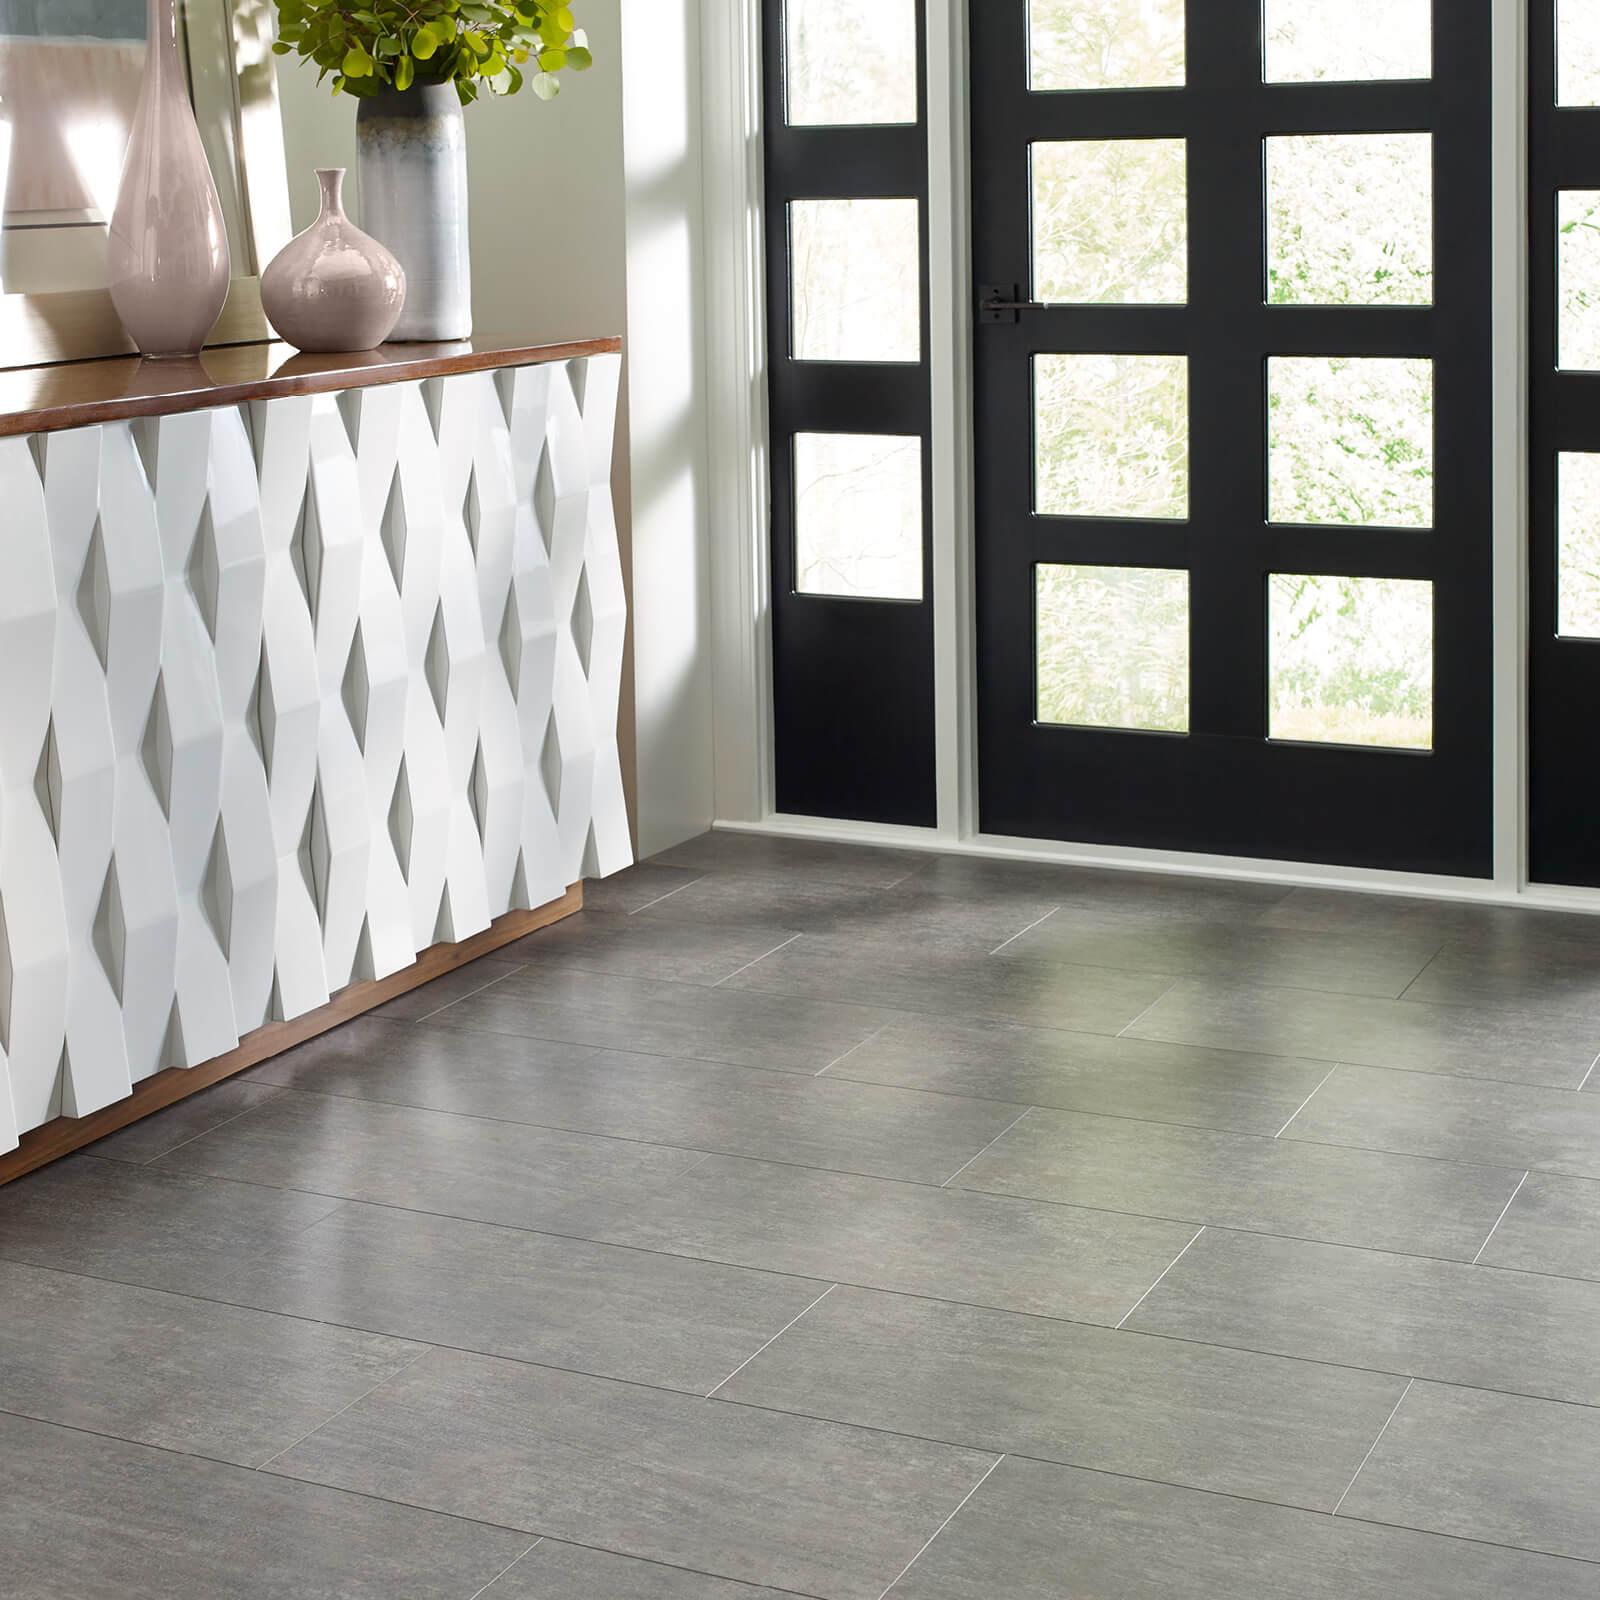 Mineral mix flooring | Dolphin Carpet & Tile